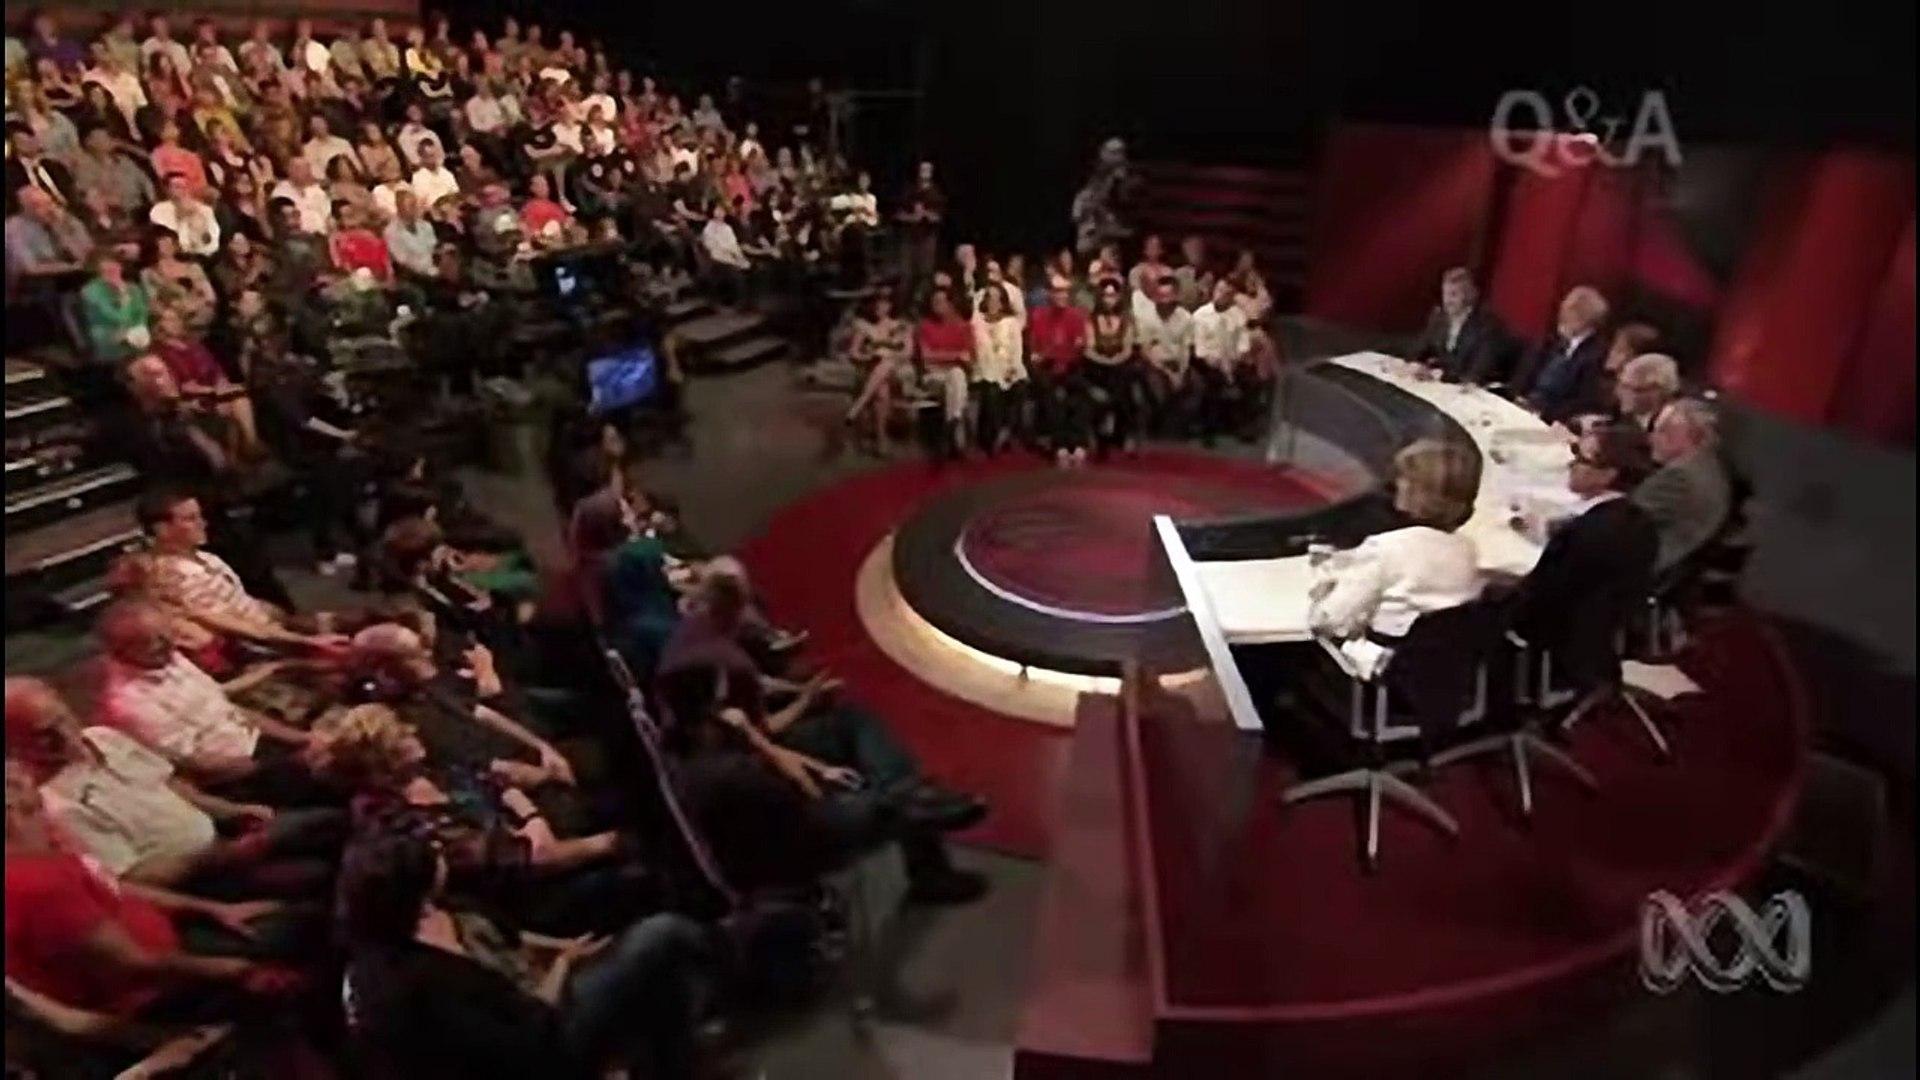 Bóg, nauka i zdrowy rozsądek. Polskie napisy. 4 / 5. God, Science and Sanity. English subtitles.